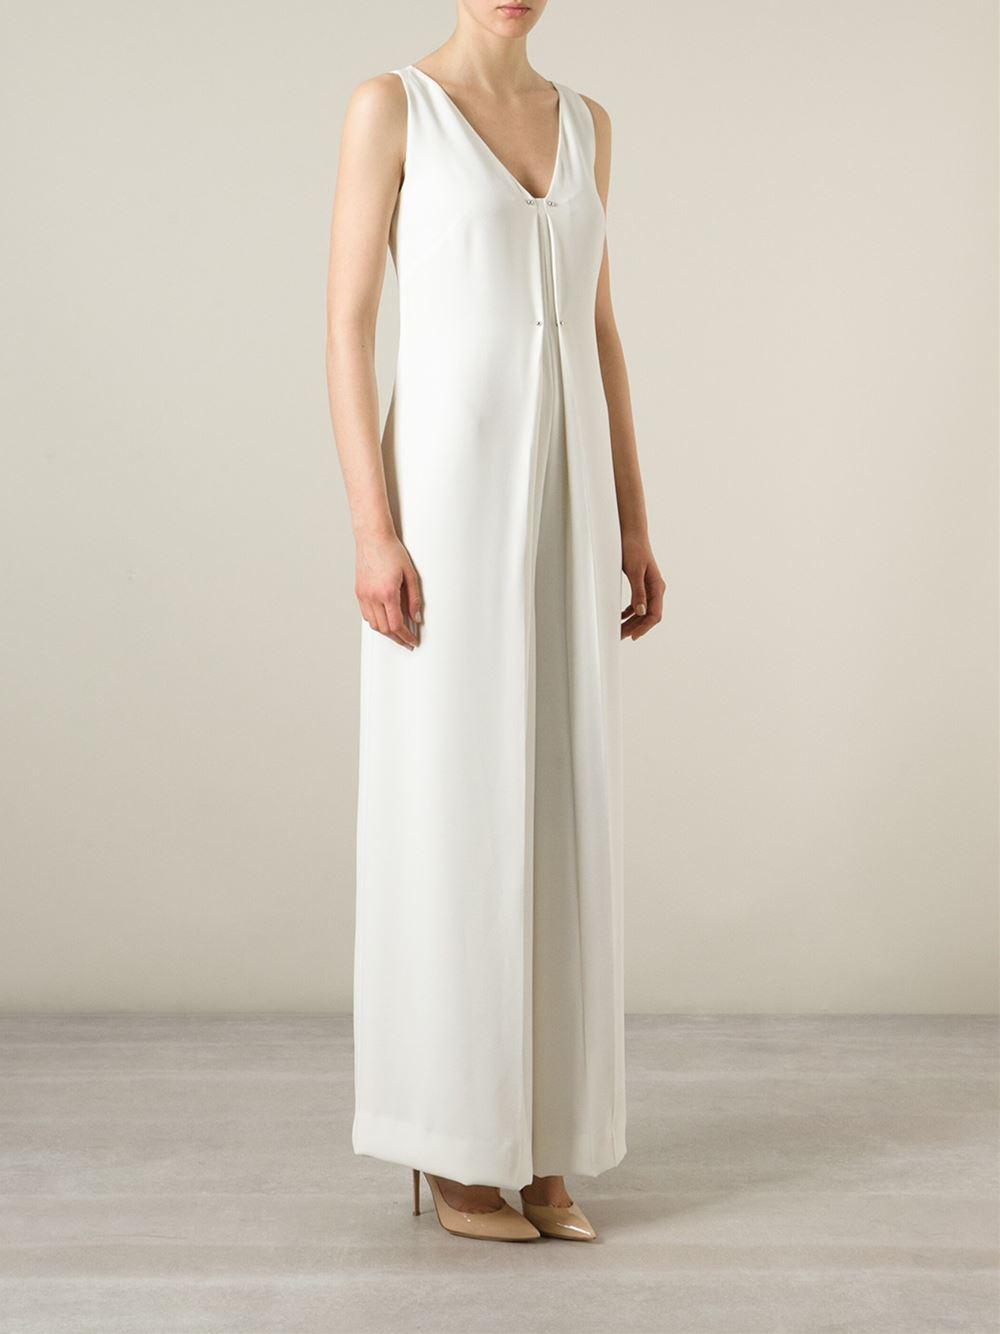 Philosophy Wide Leg Jumpsuit in White | Lyst